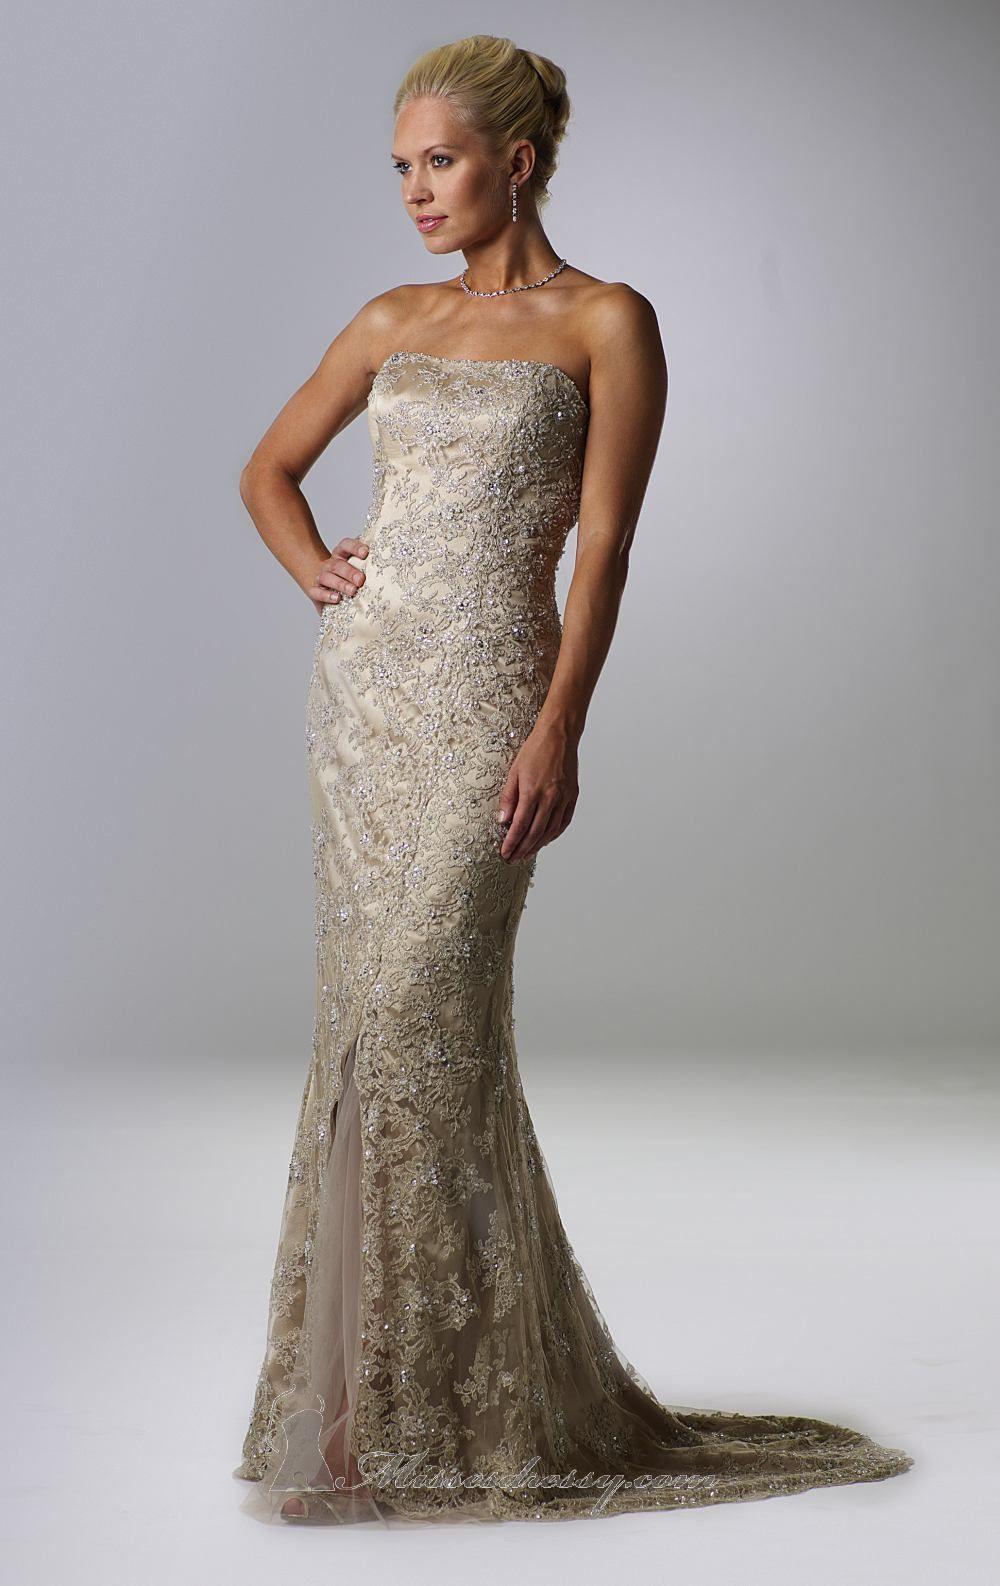 Wedding dress for evening  Rina diMontella  Dress  MissesDressy  Evening Dresses